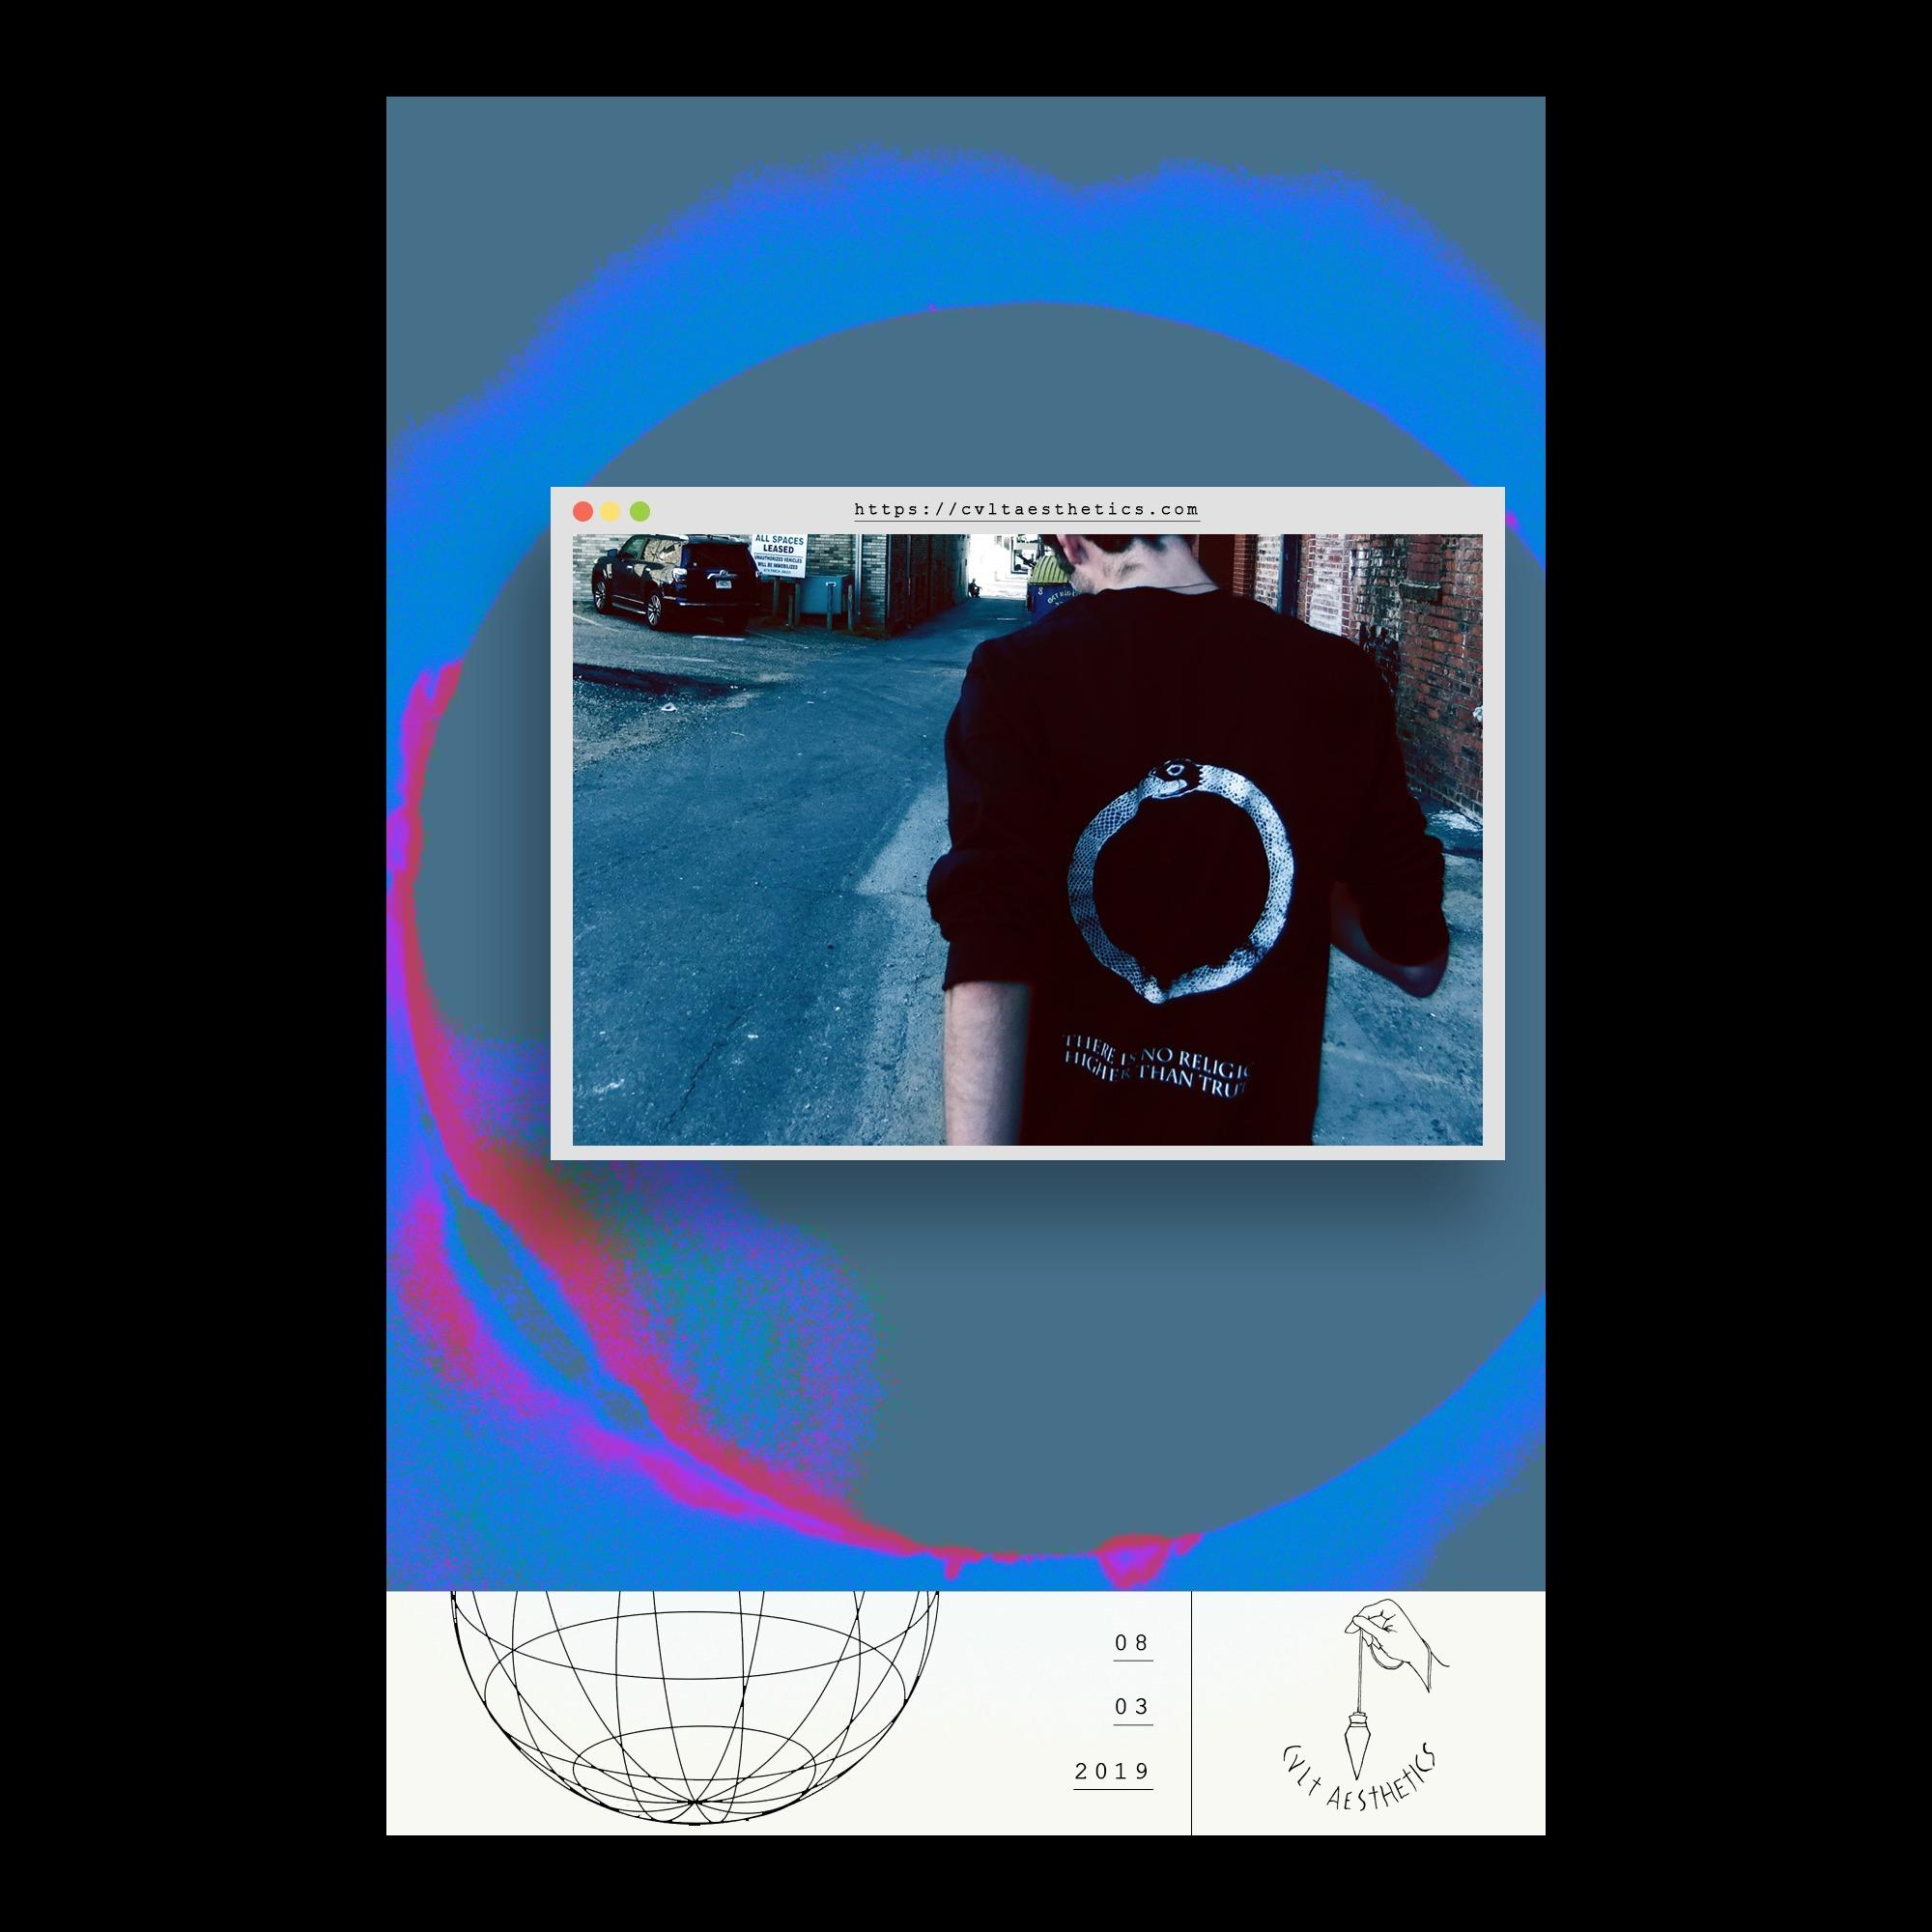 elated share releasing collecti - cvltaesthetics | ello